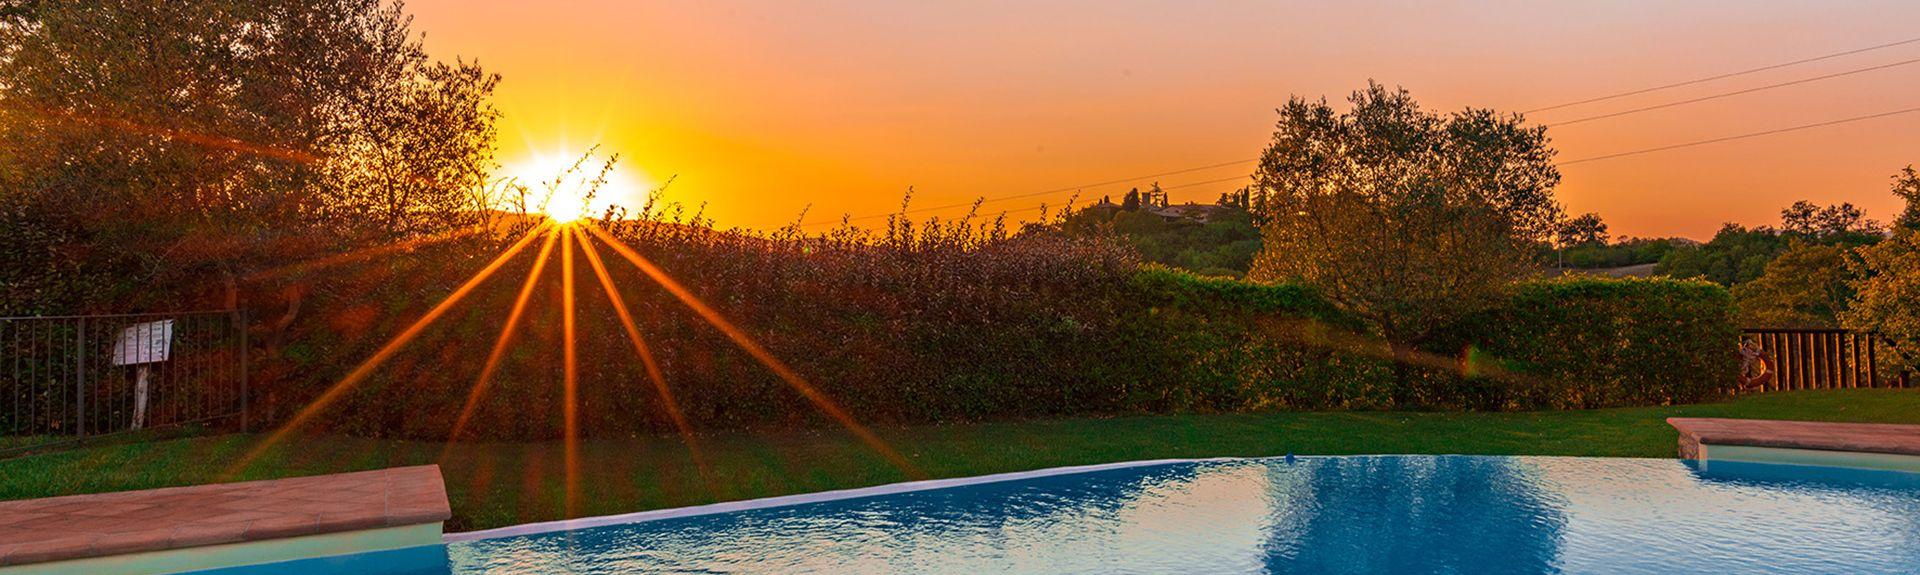 Roccatederighi, Roccastrada, Tuscany, Italy